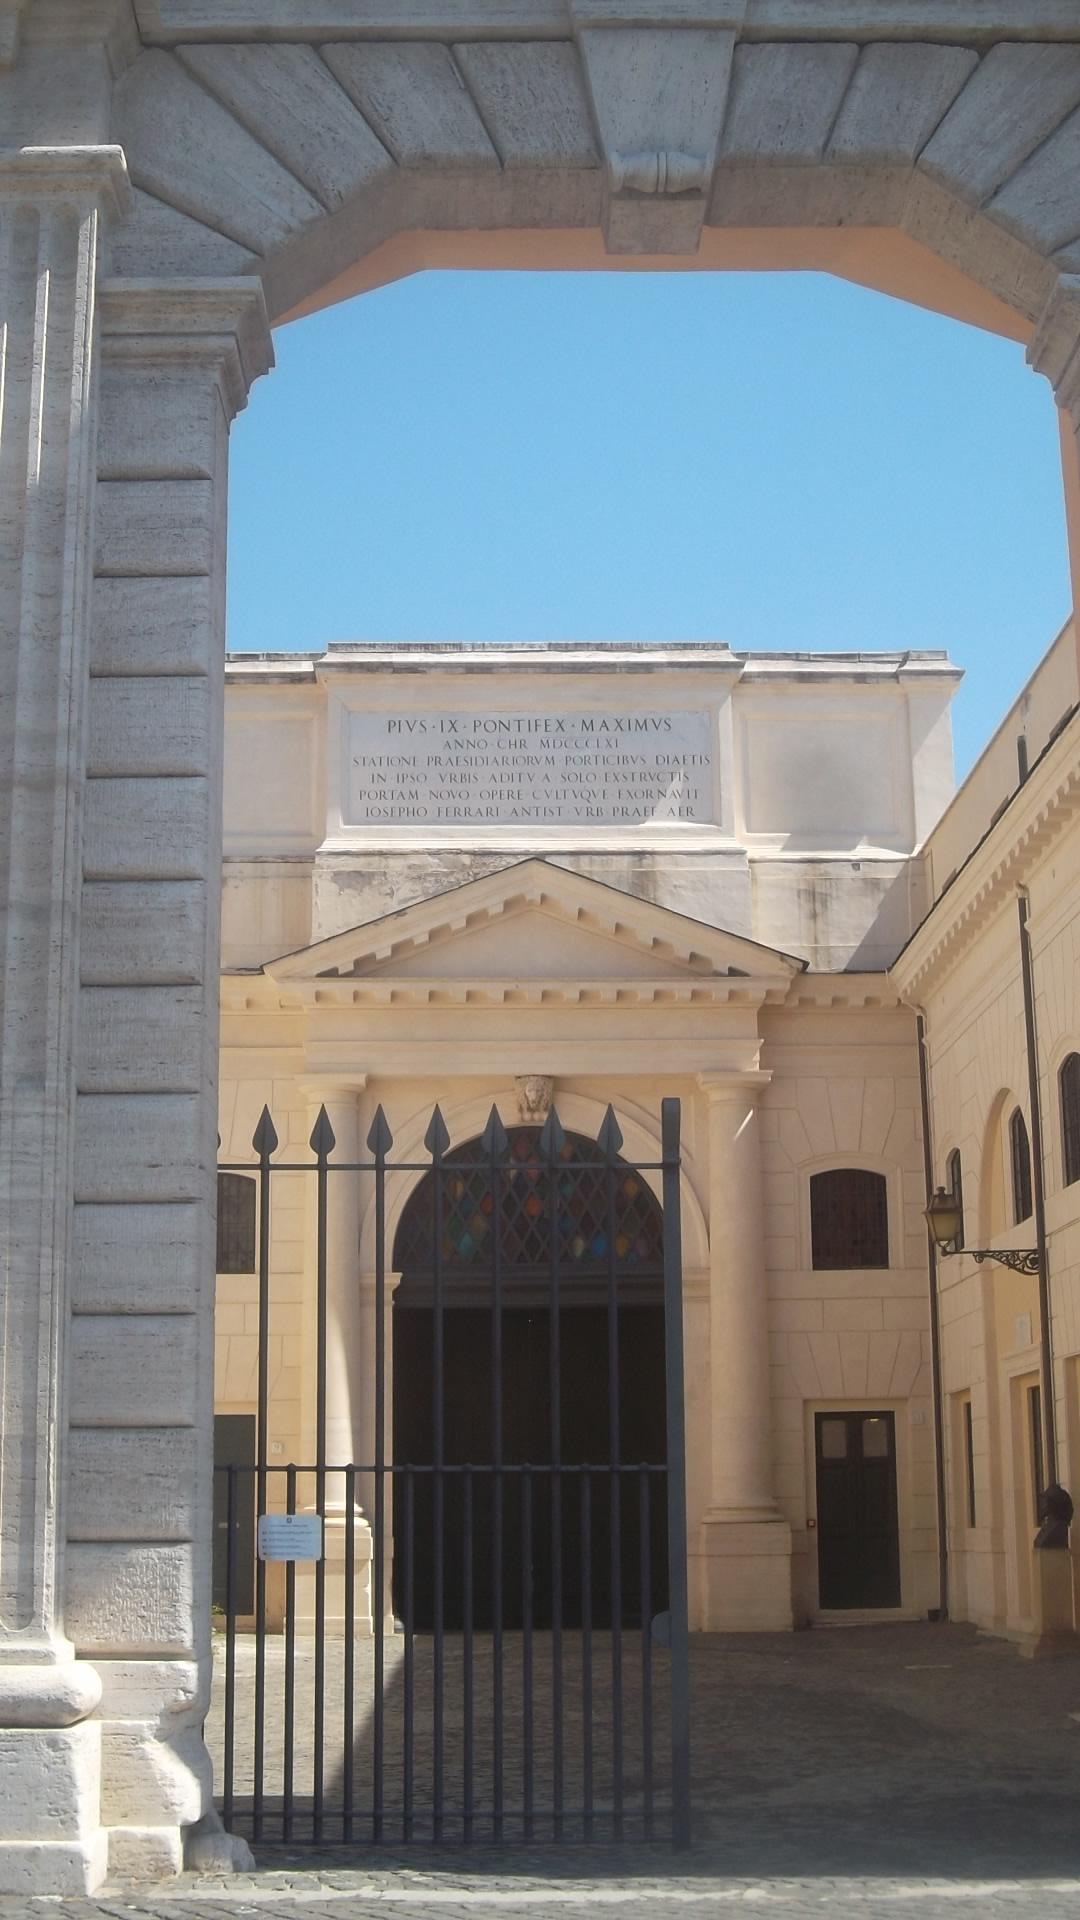 roma-museo-historico-bersaglieri-back-ent-aug13